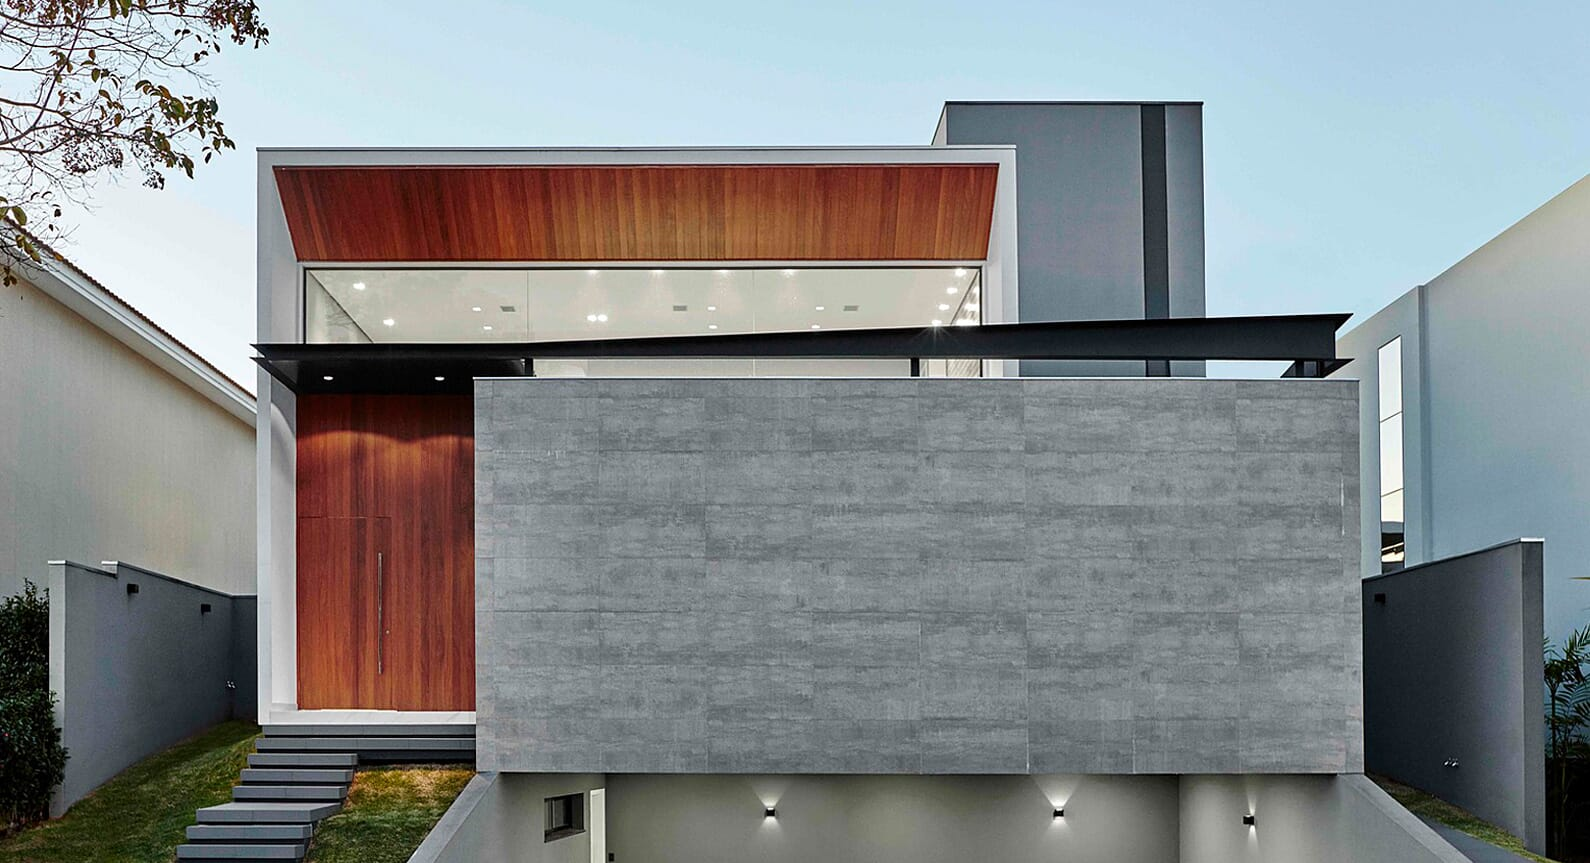 Solitude In The City: The Cumaru House By Raffo Arquitetura